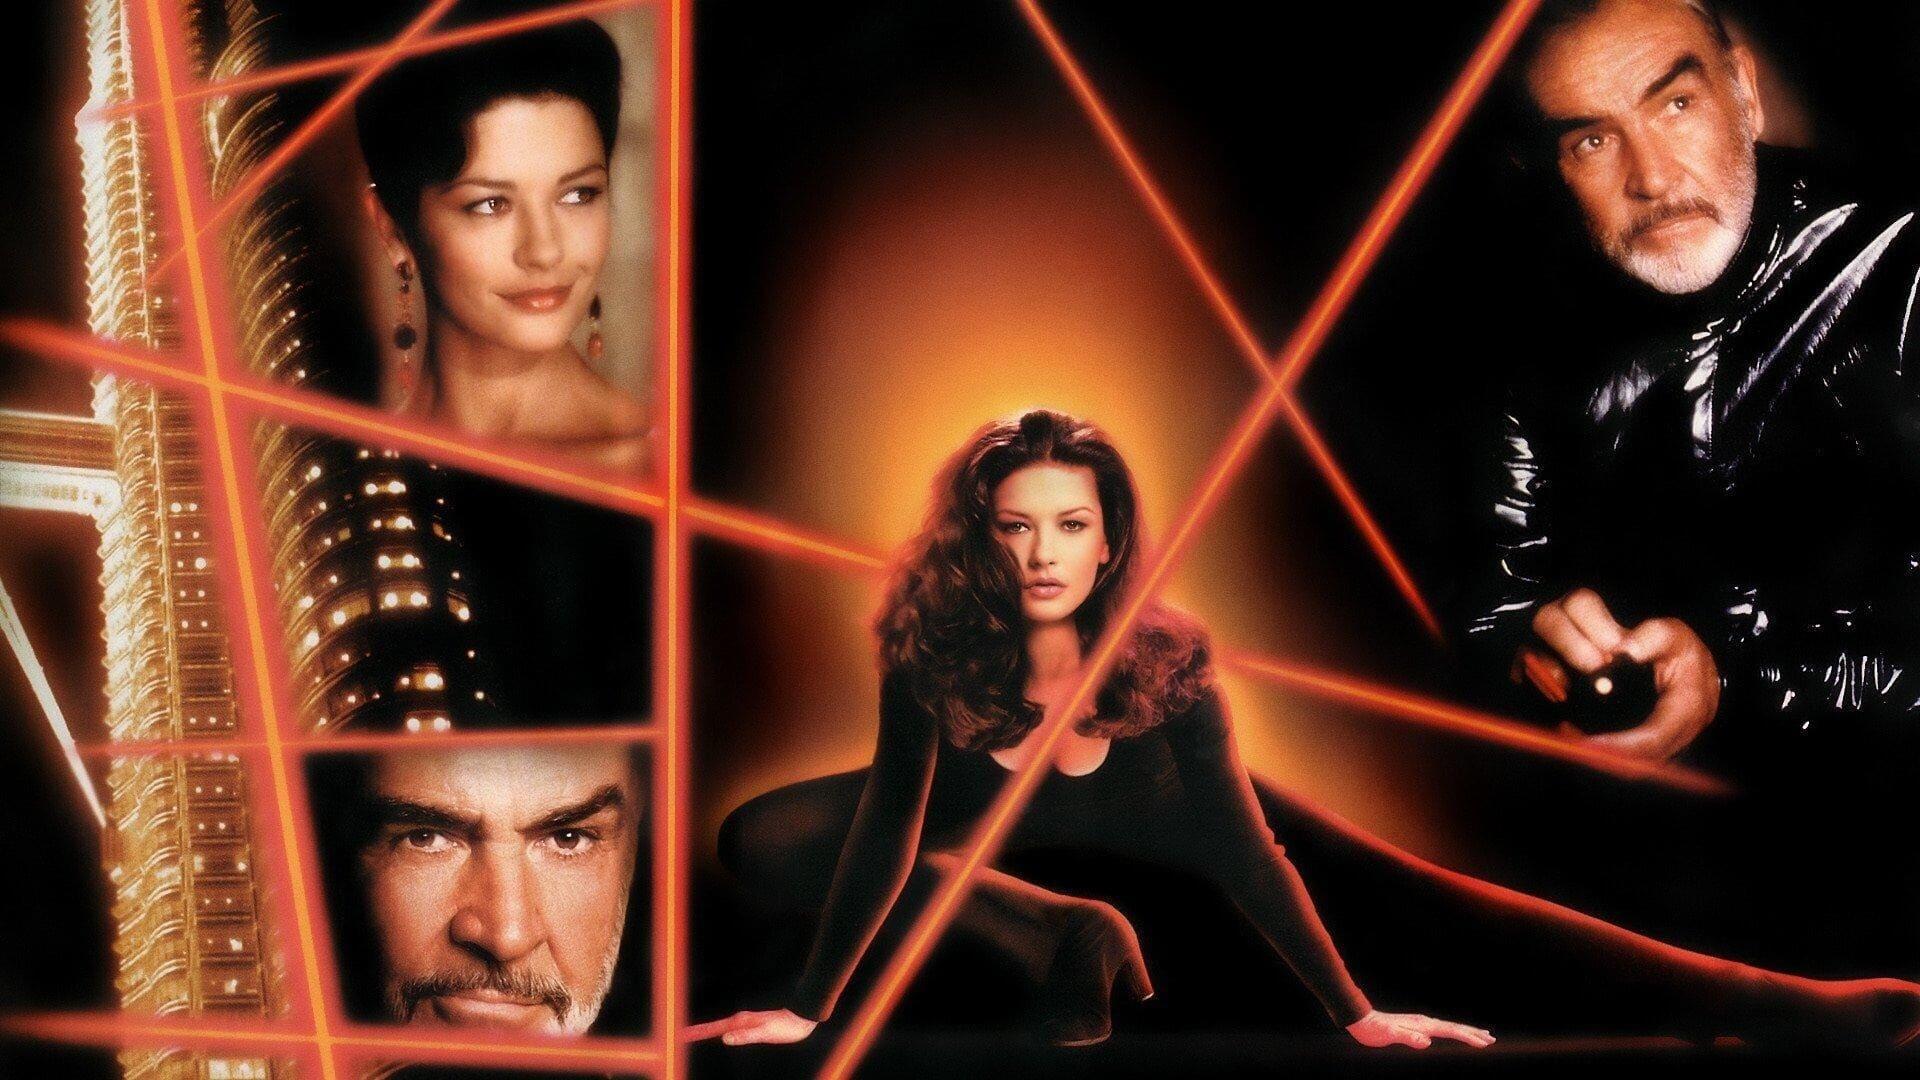 Briliáns csapda (1999)